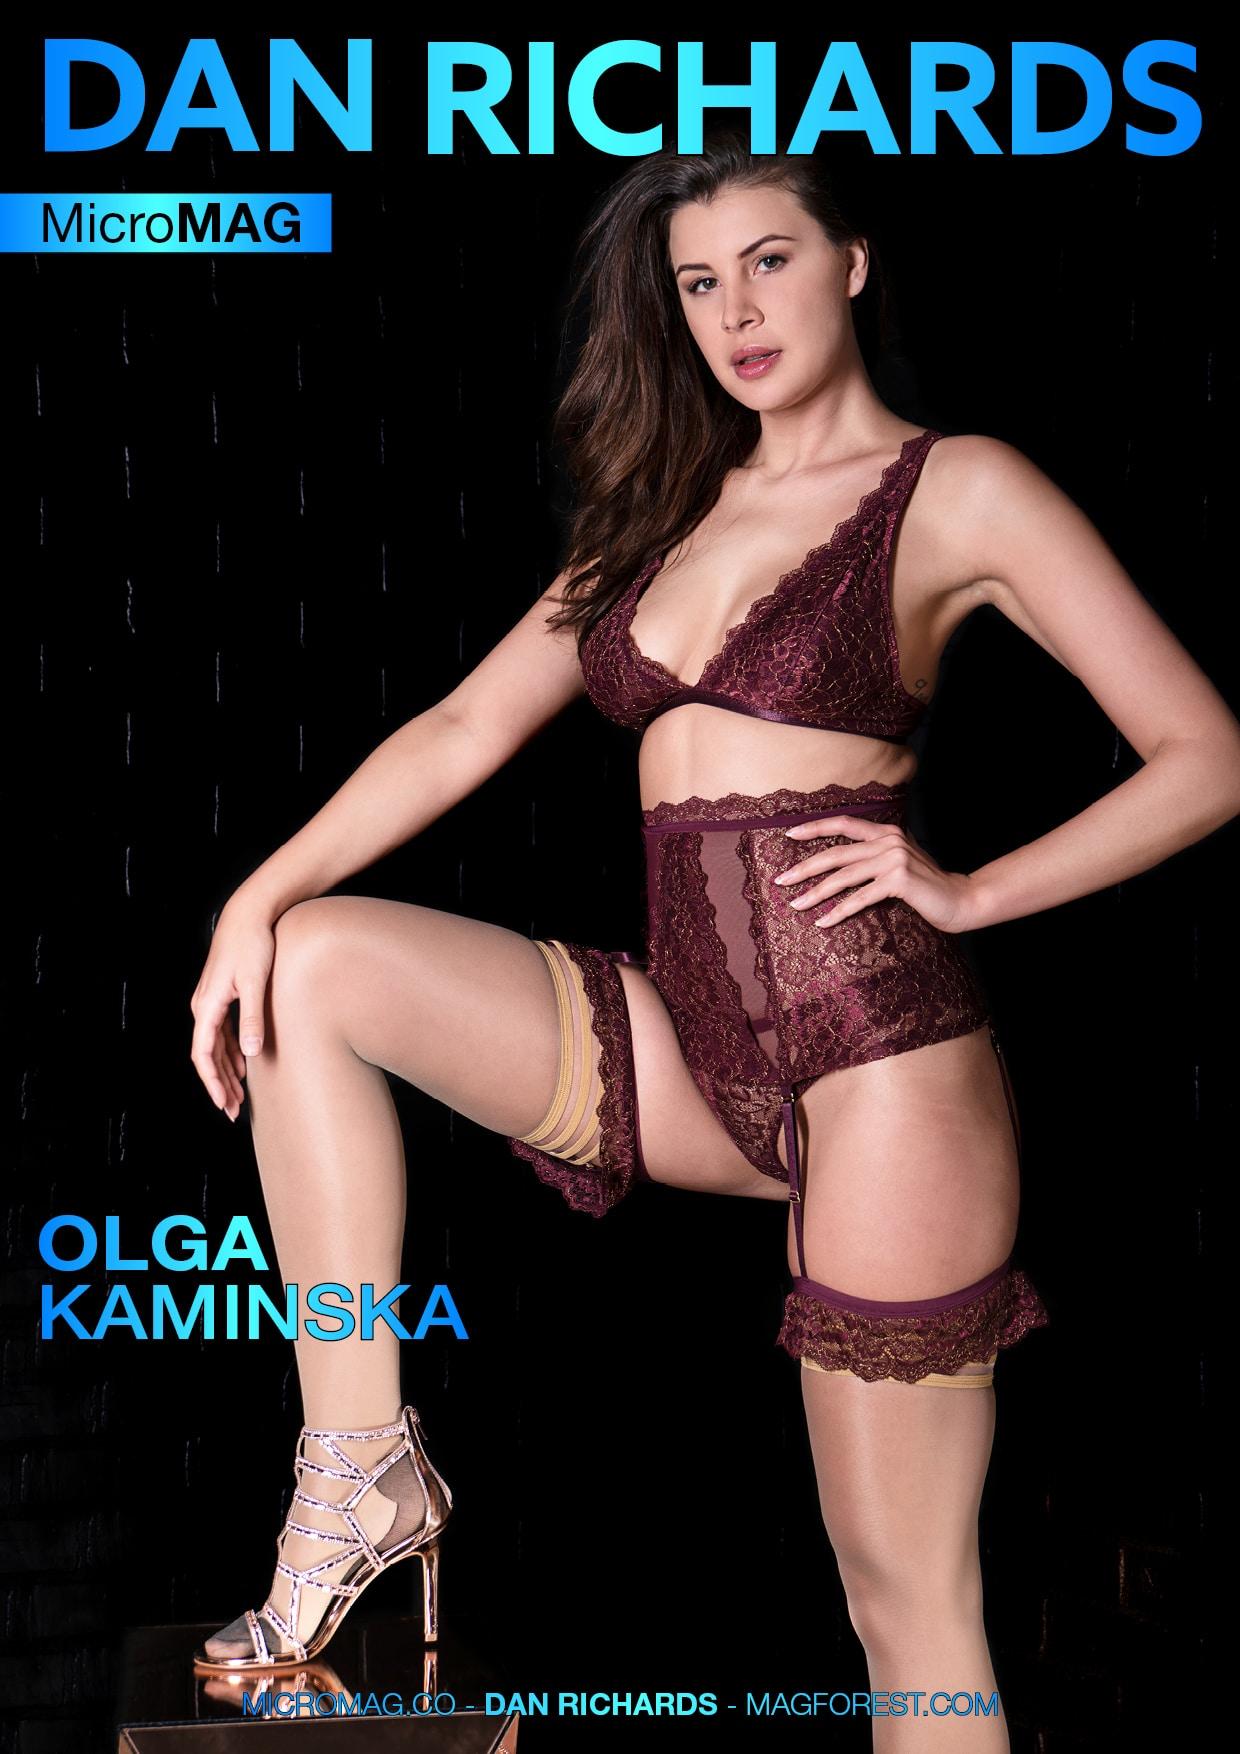 Dan Richards MicroMAG - Olga Kaminska - Issue 2